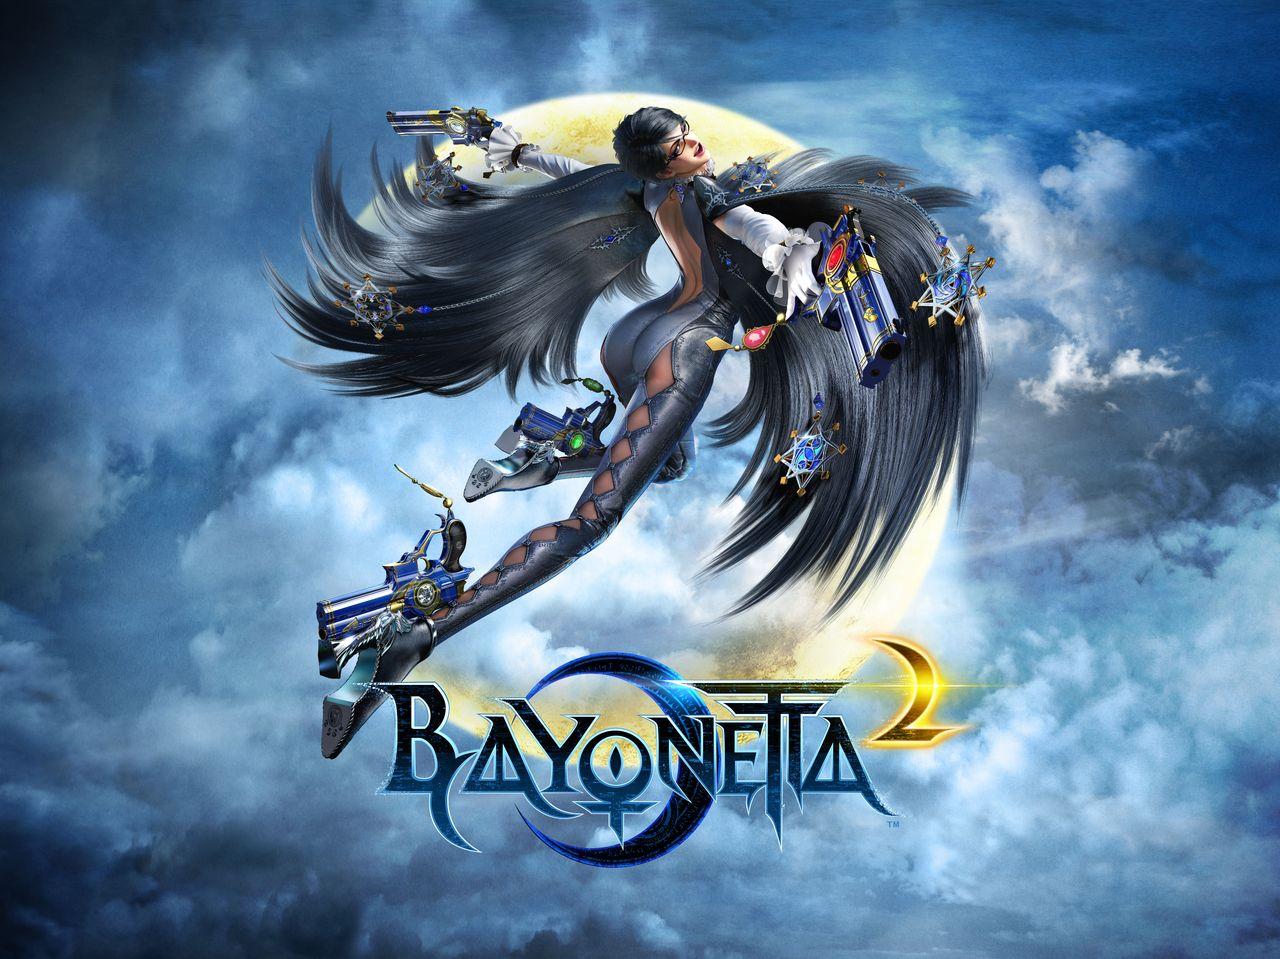 Bayonetta 2 Wii U Platinum Games